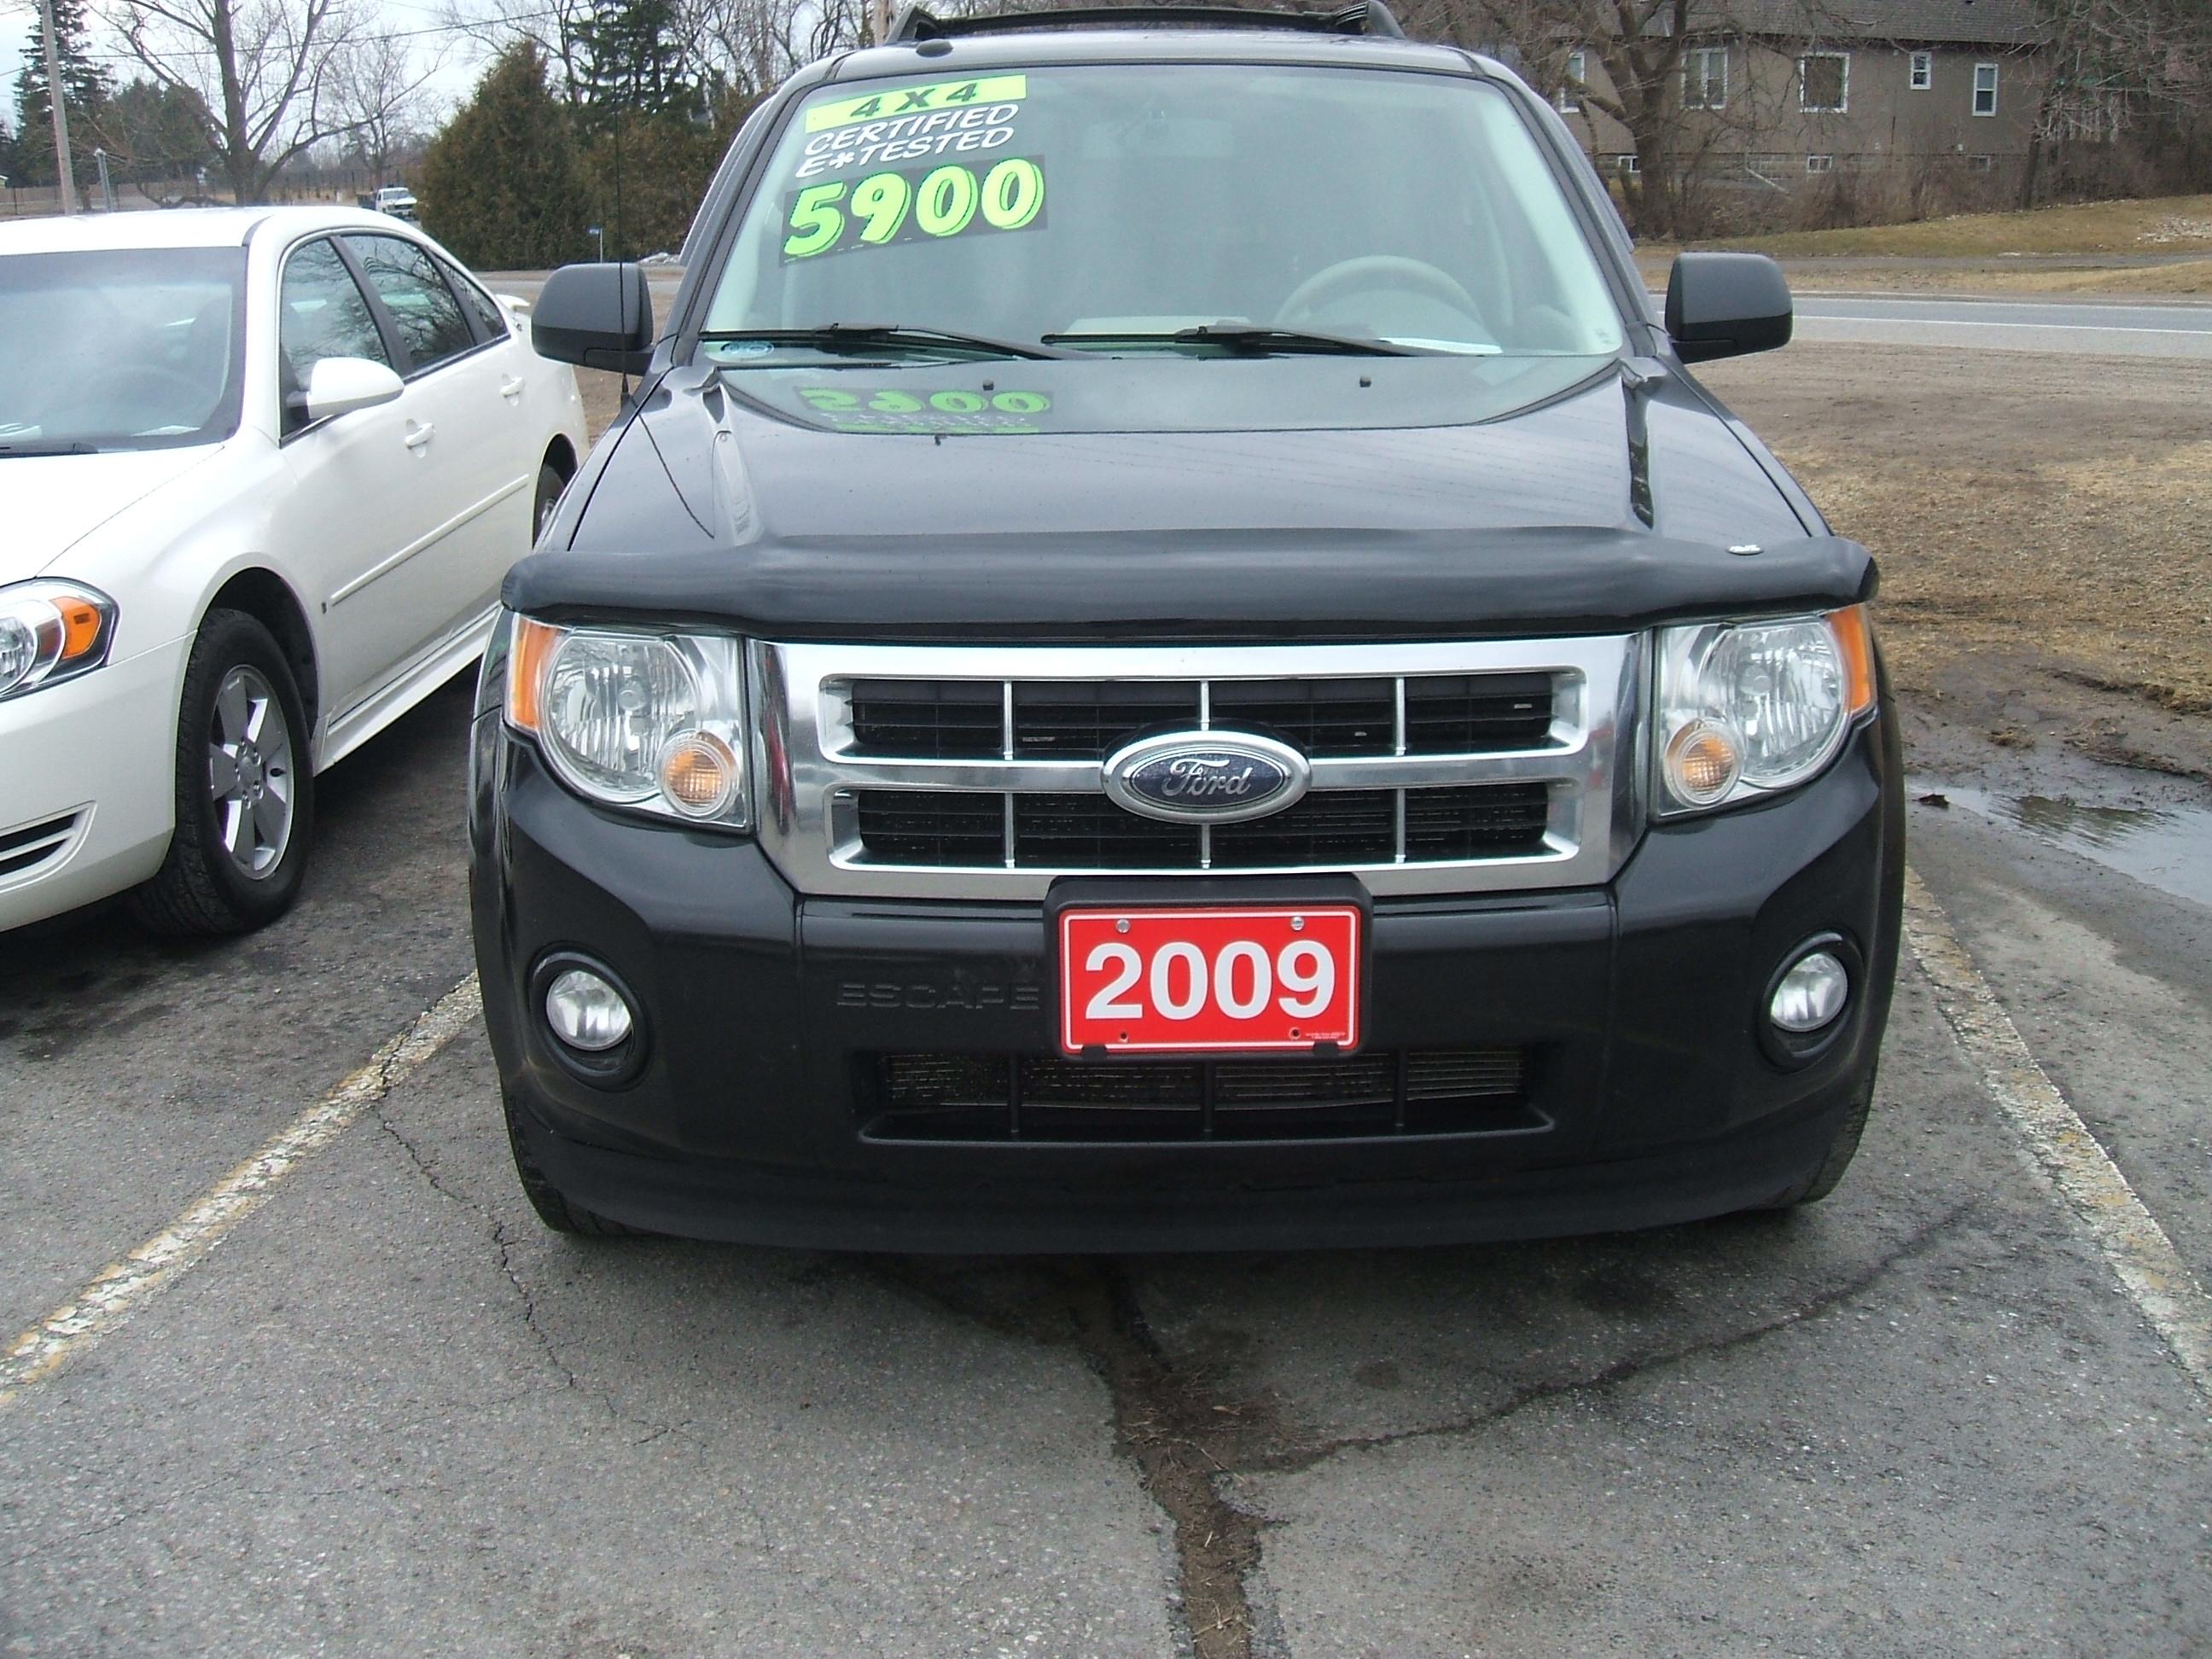 2009 FORD ESCAPE XLT 4X4 INTERIOR (3) | Bob Currie Auto Sales